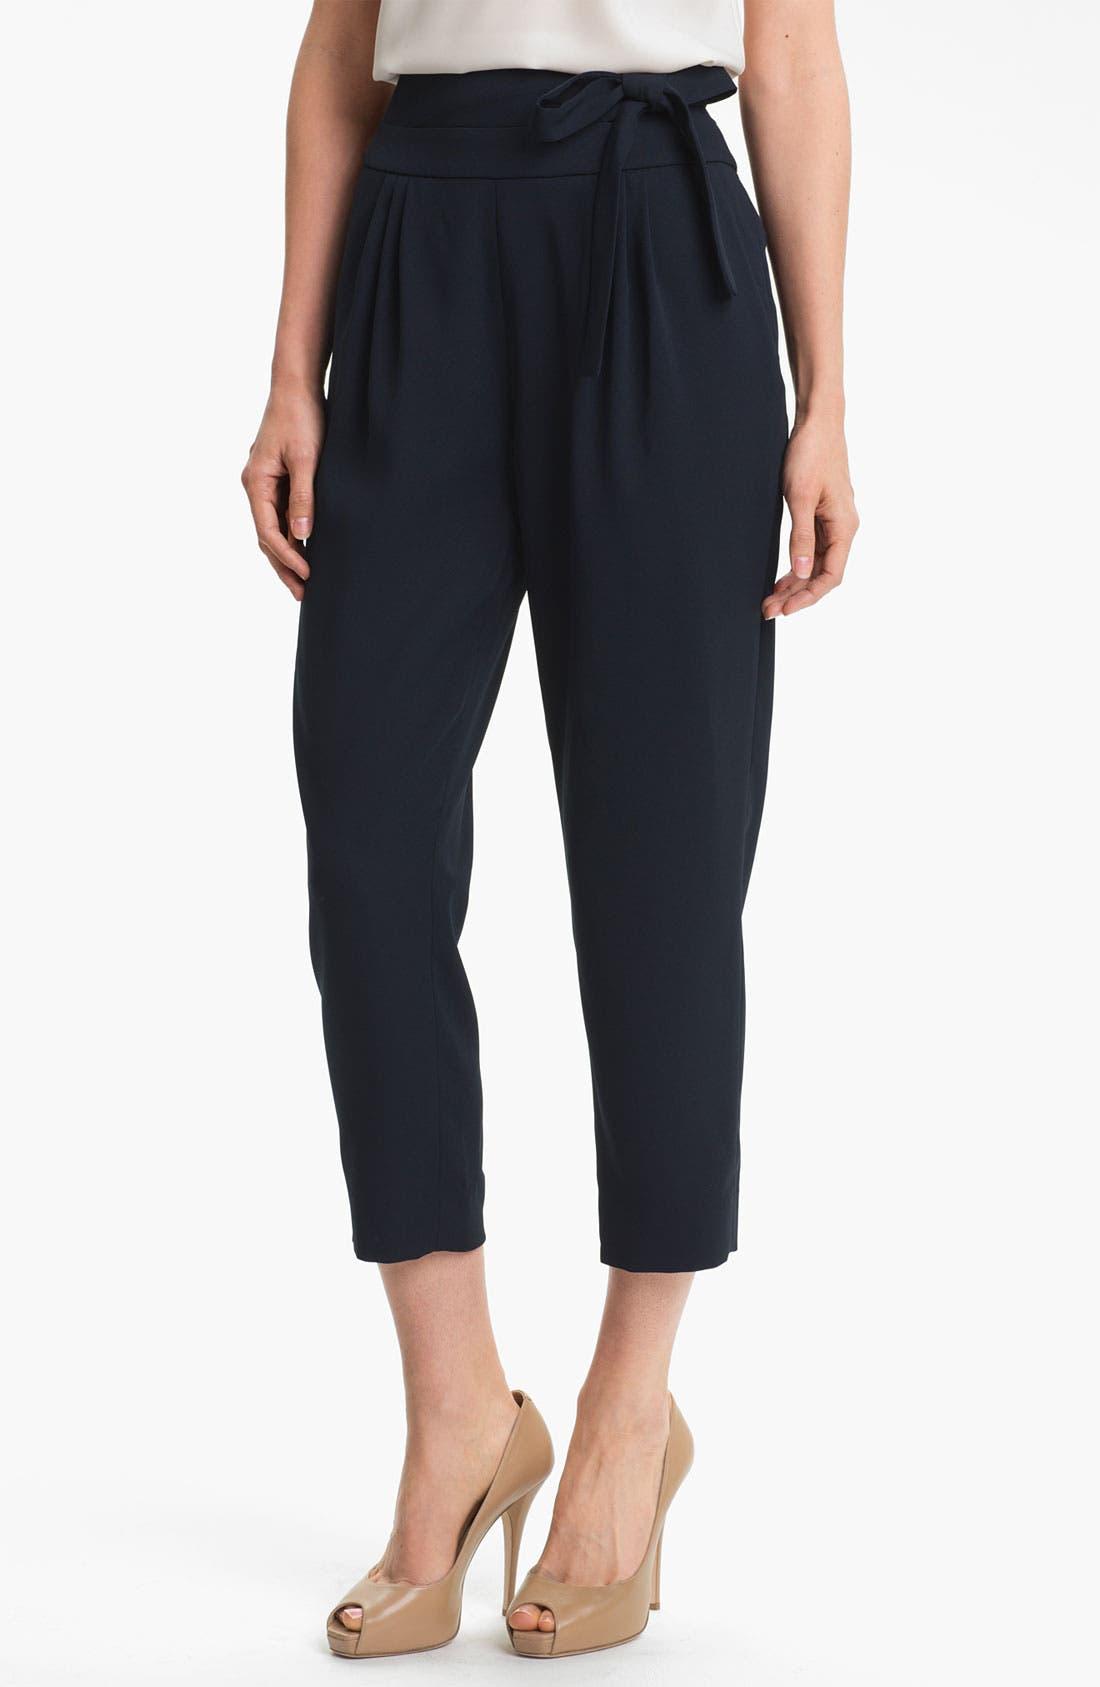 Alternate Image 1 Selected - Diane von Furstenberg 'Keaka' Capri Pants